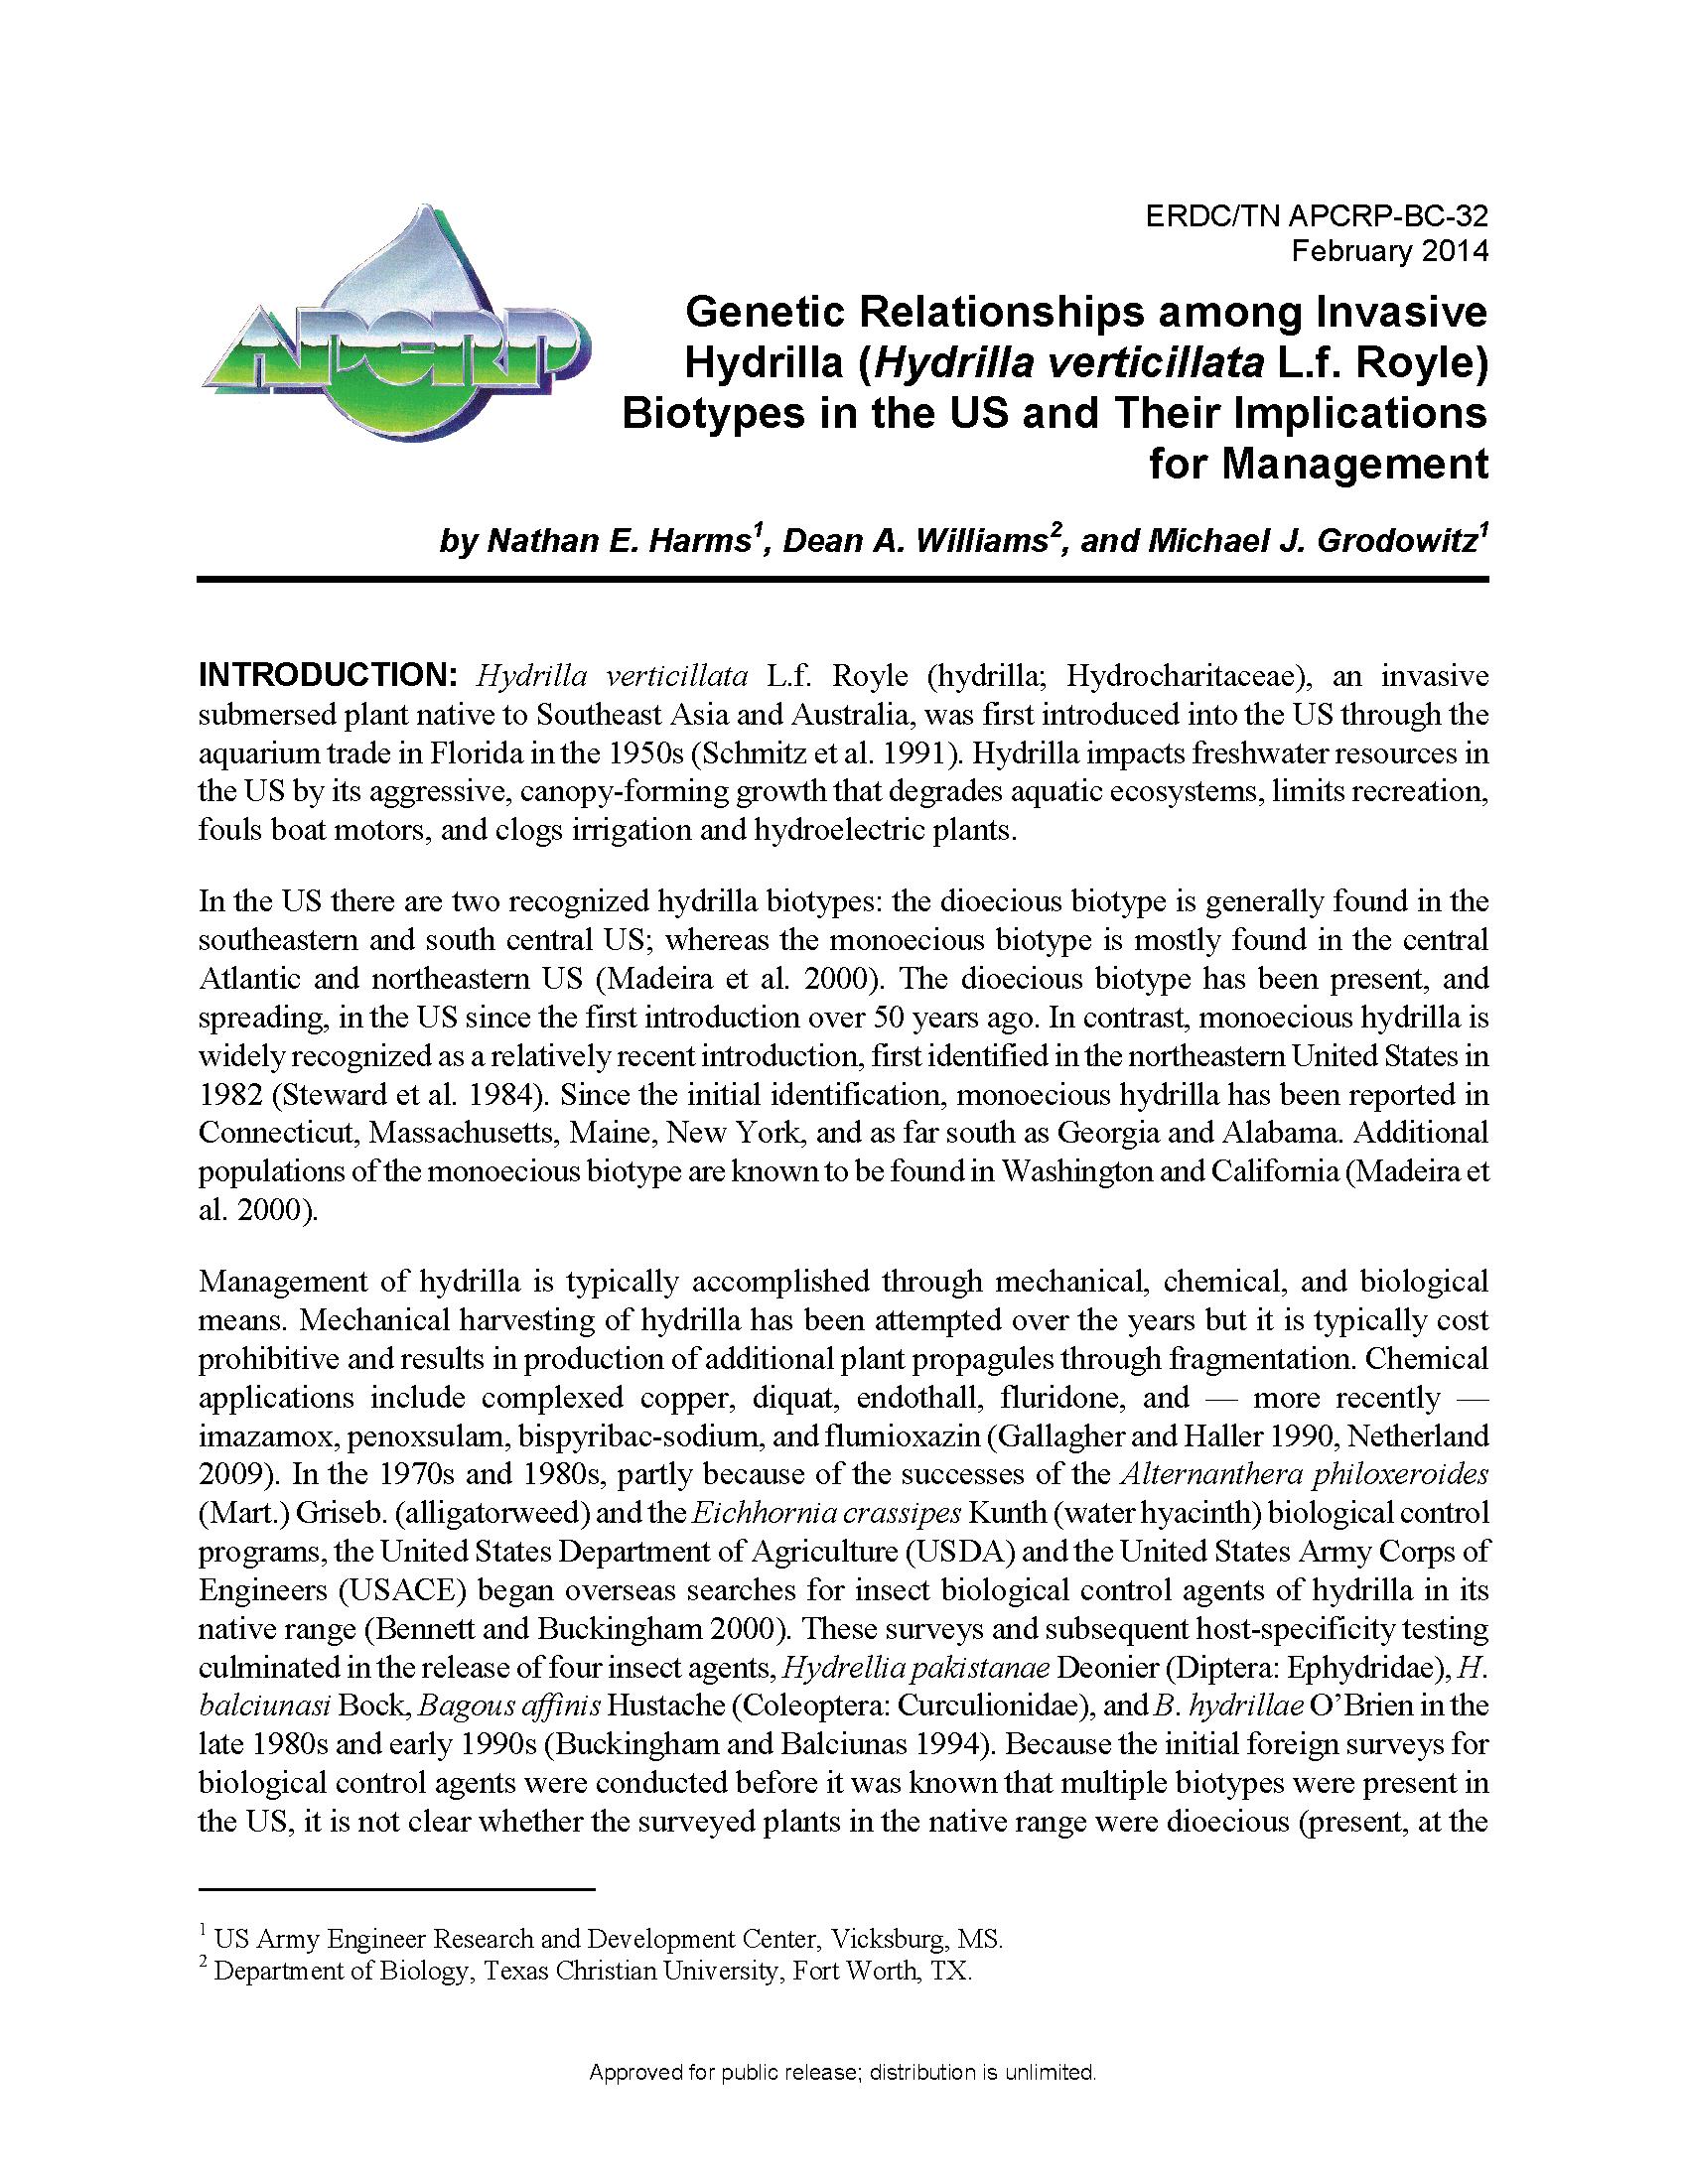 Genetic relationships among invasive hydrilla Hydrilla verticillata